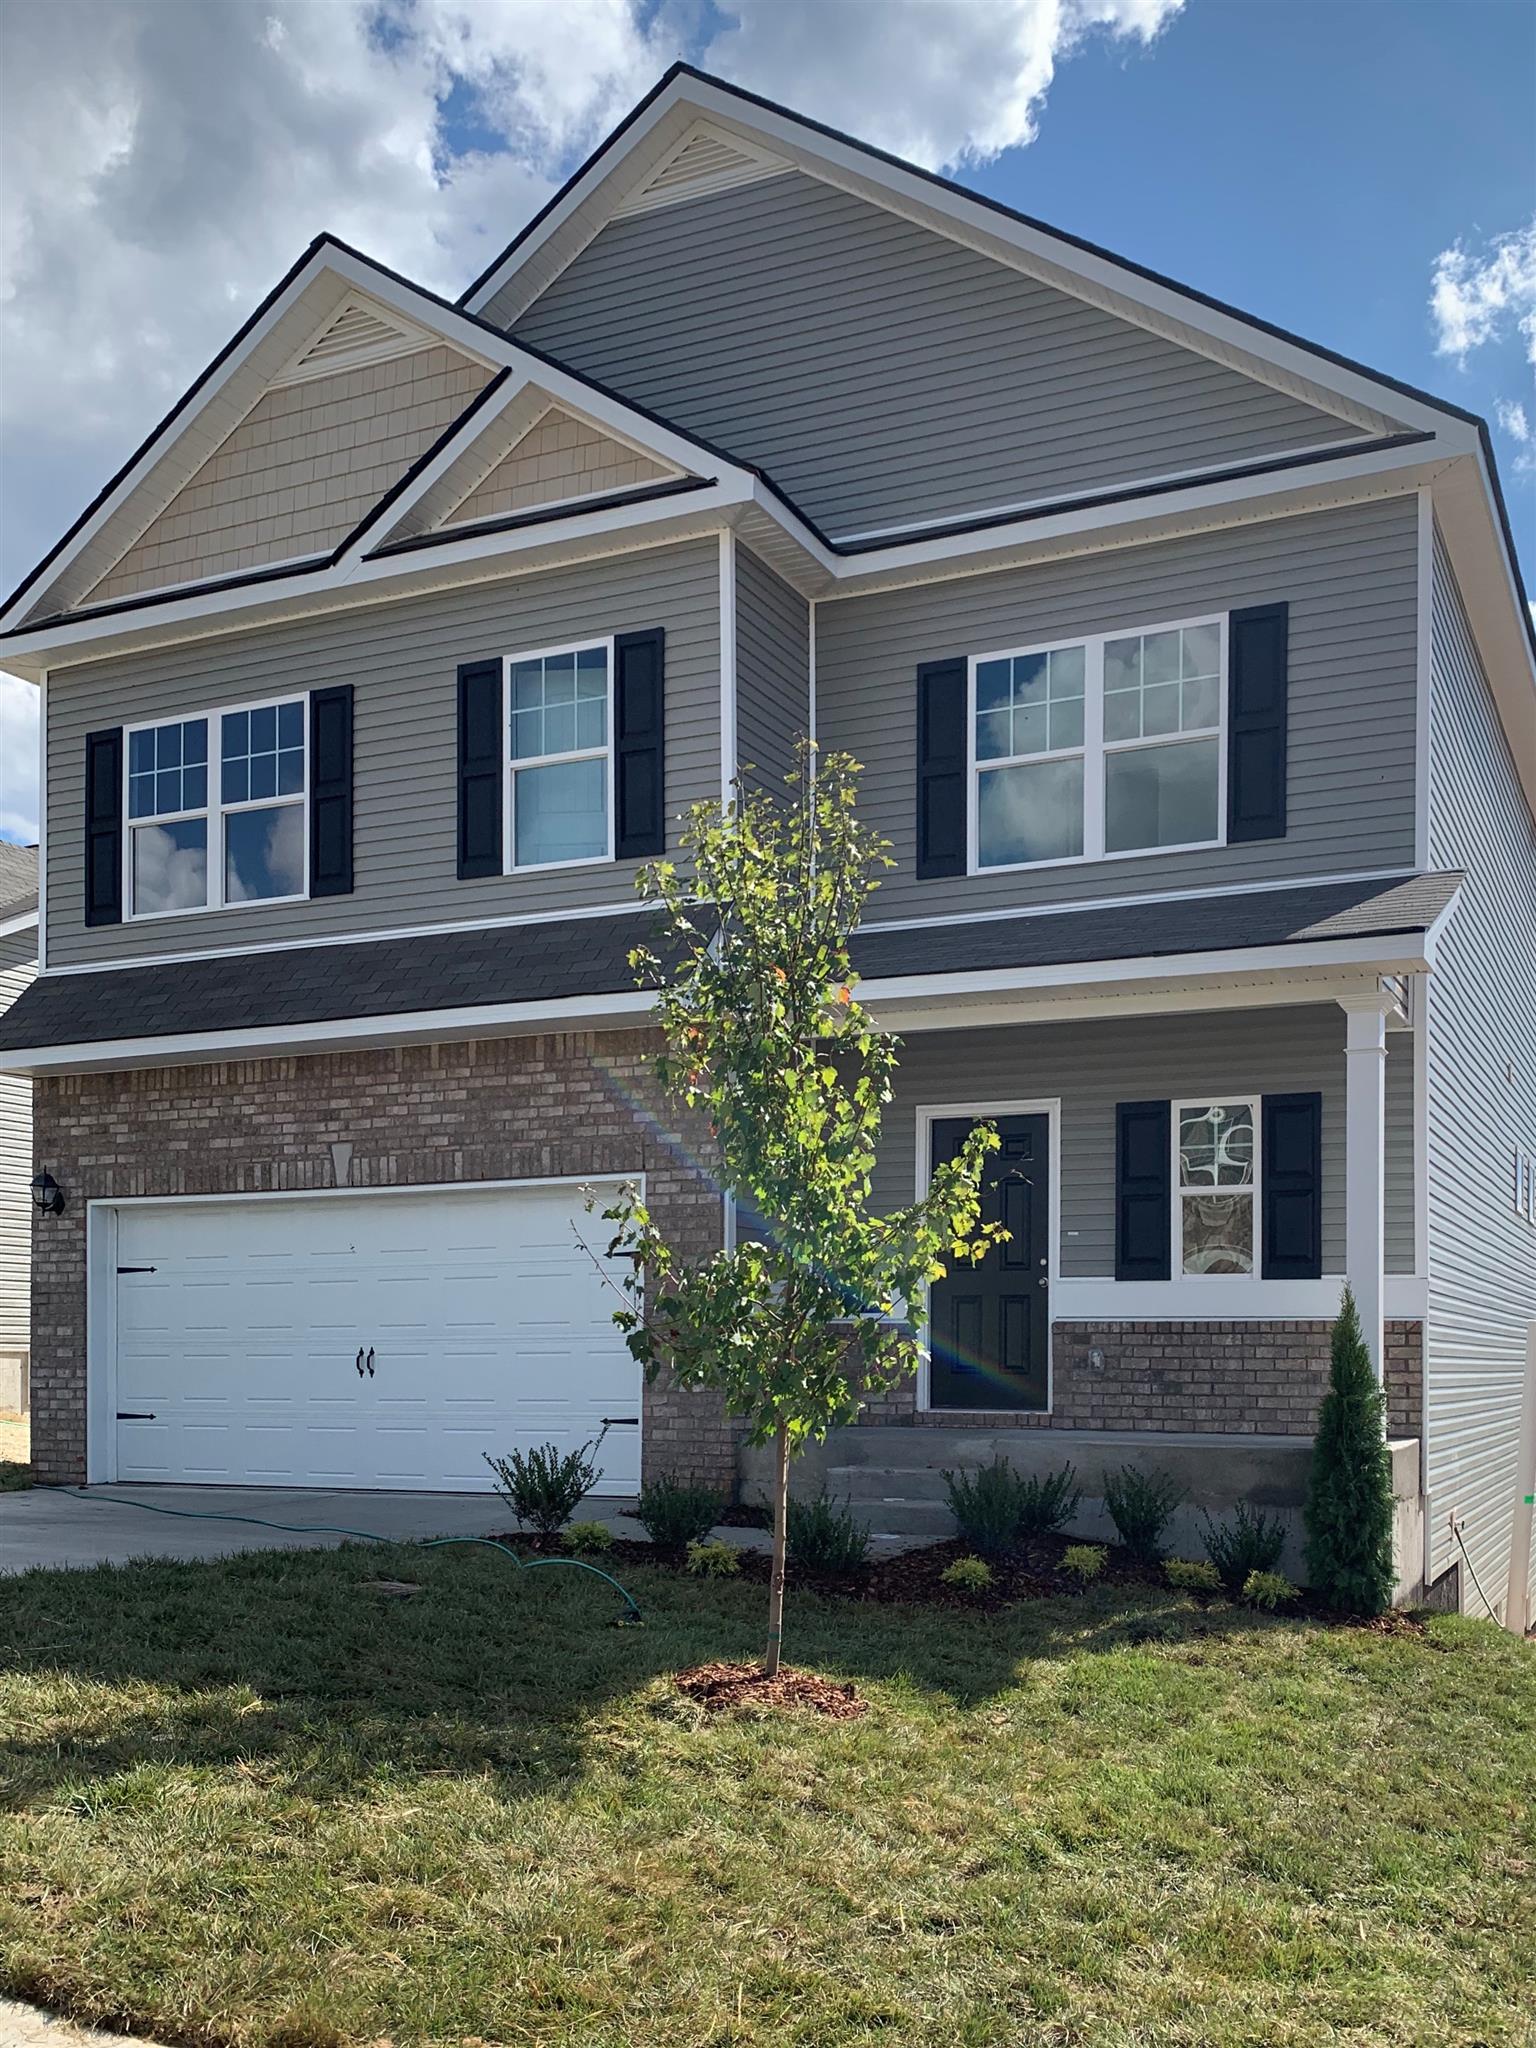 320 Timewinder Way (Lot 320), Columbia, TN 38401 - Columbia, TN real estate listing